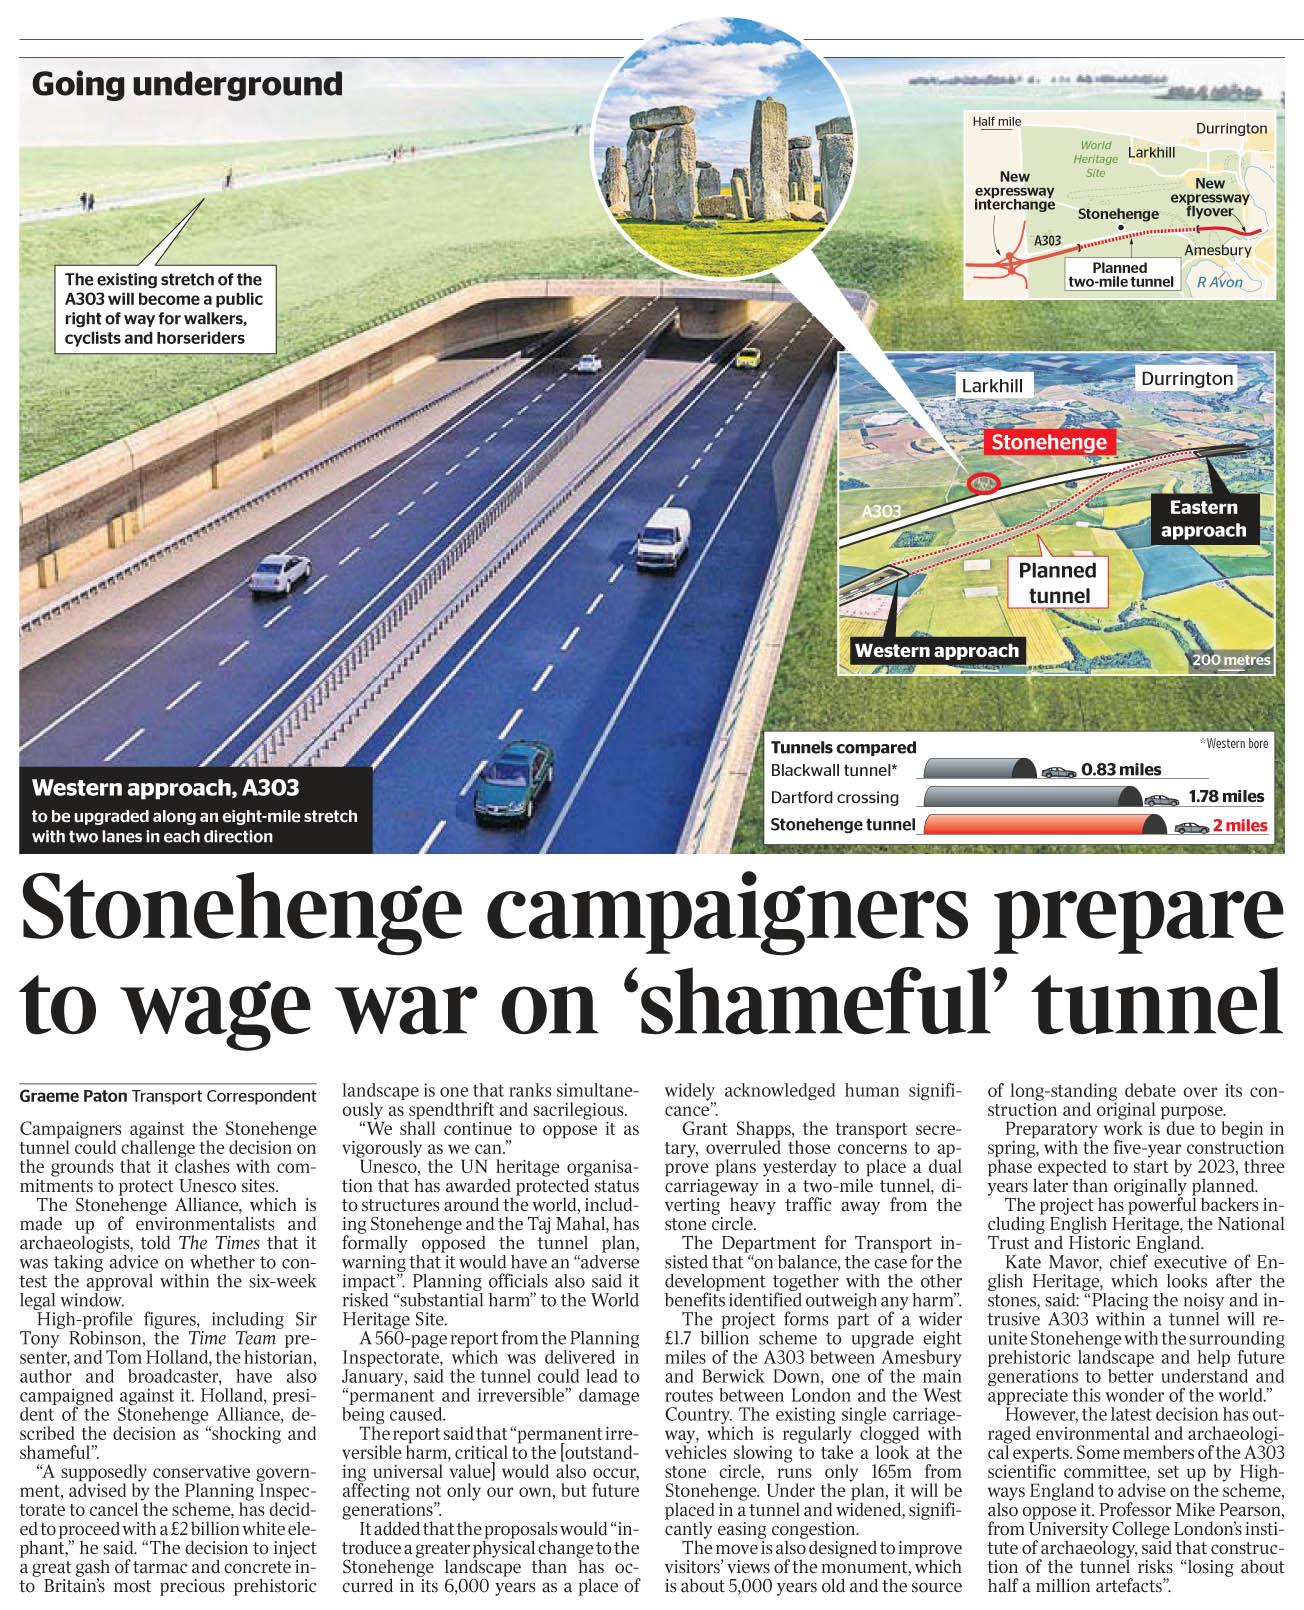 Times 201113 Stonehenge tunnel.jpg